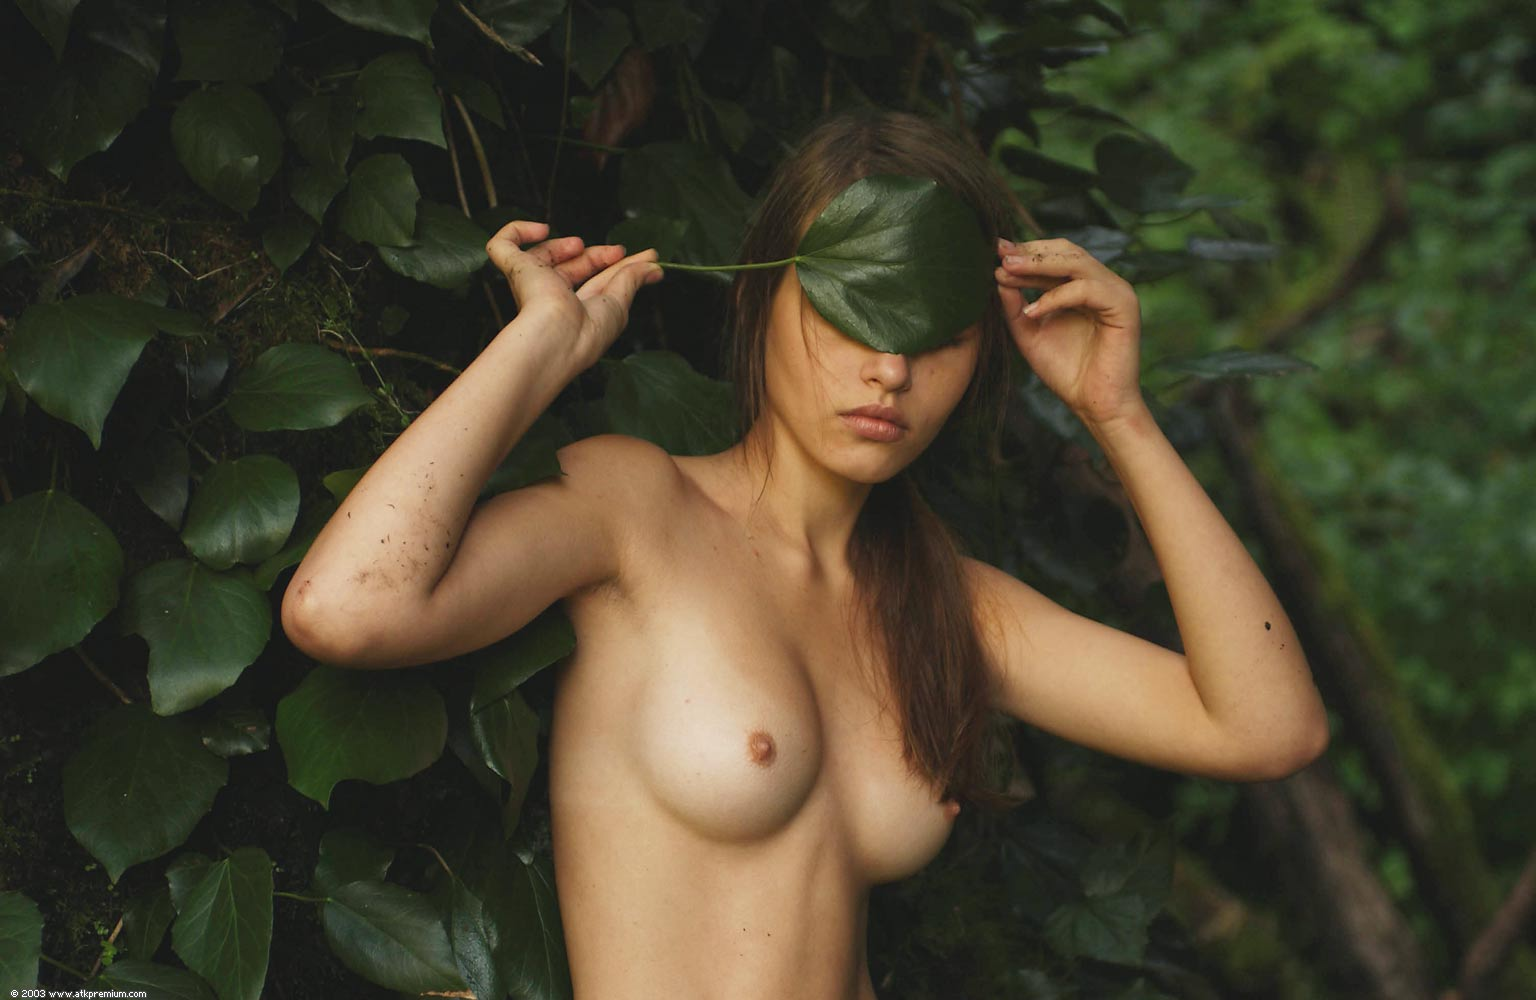 Galitsin art nackt porn star